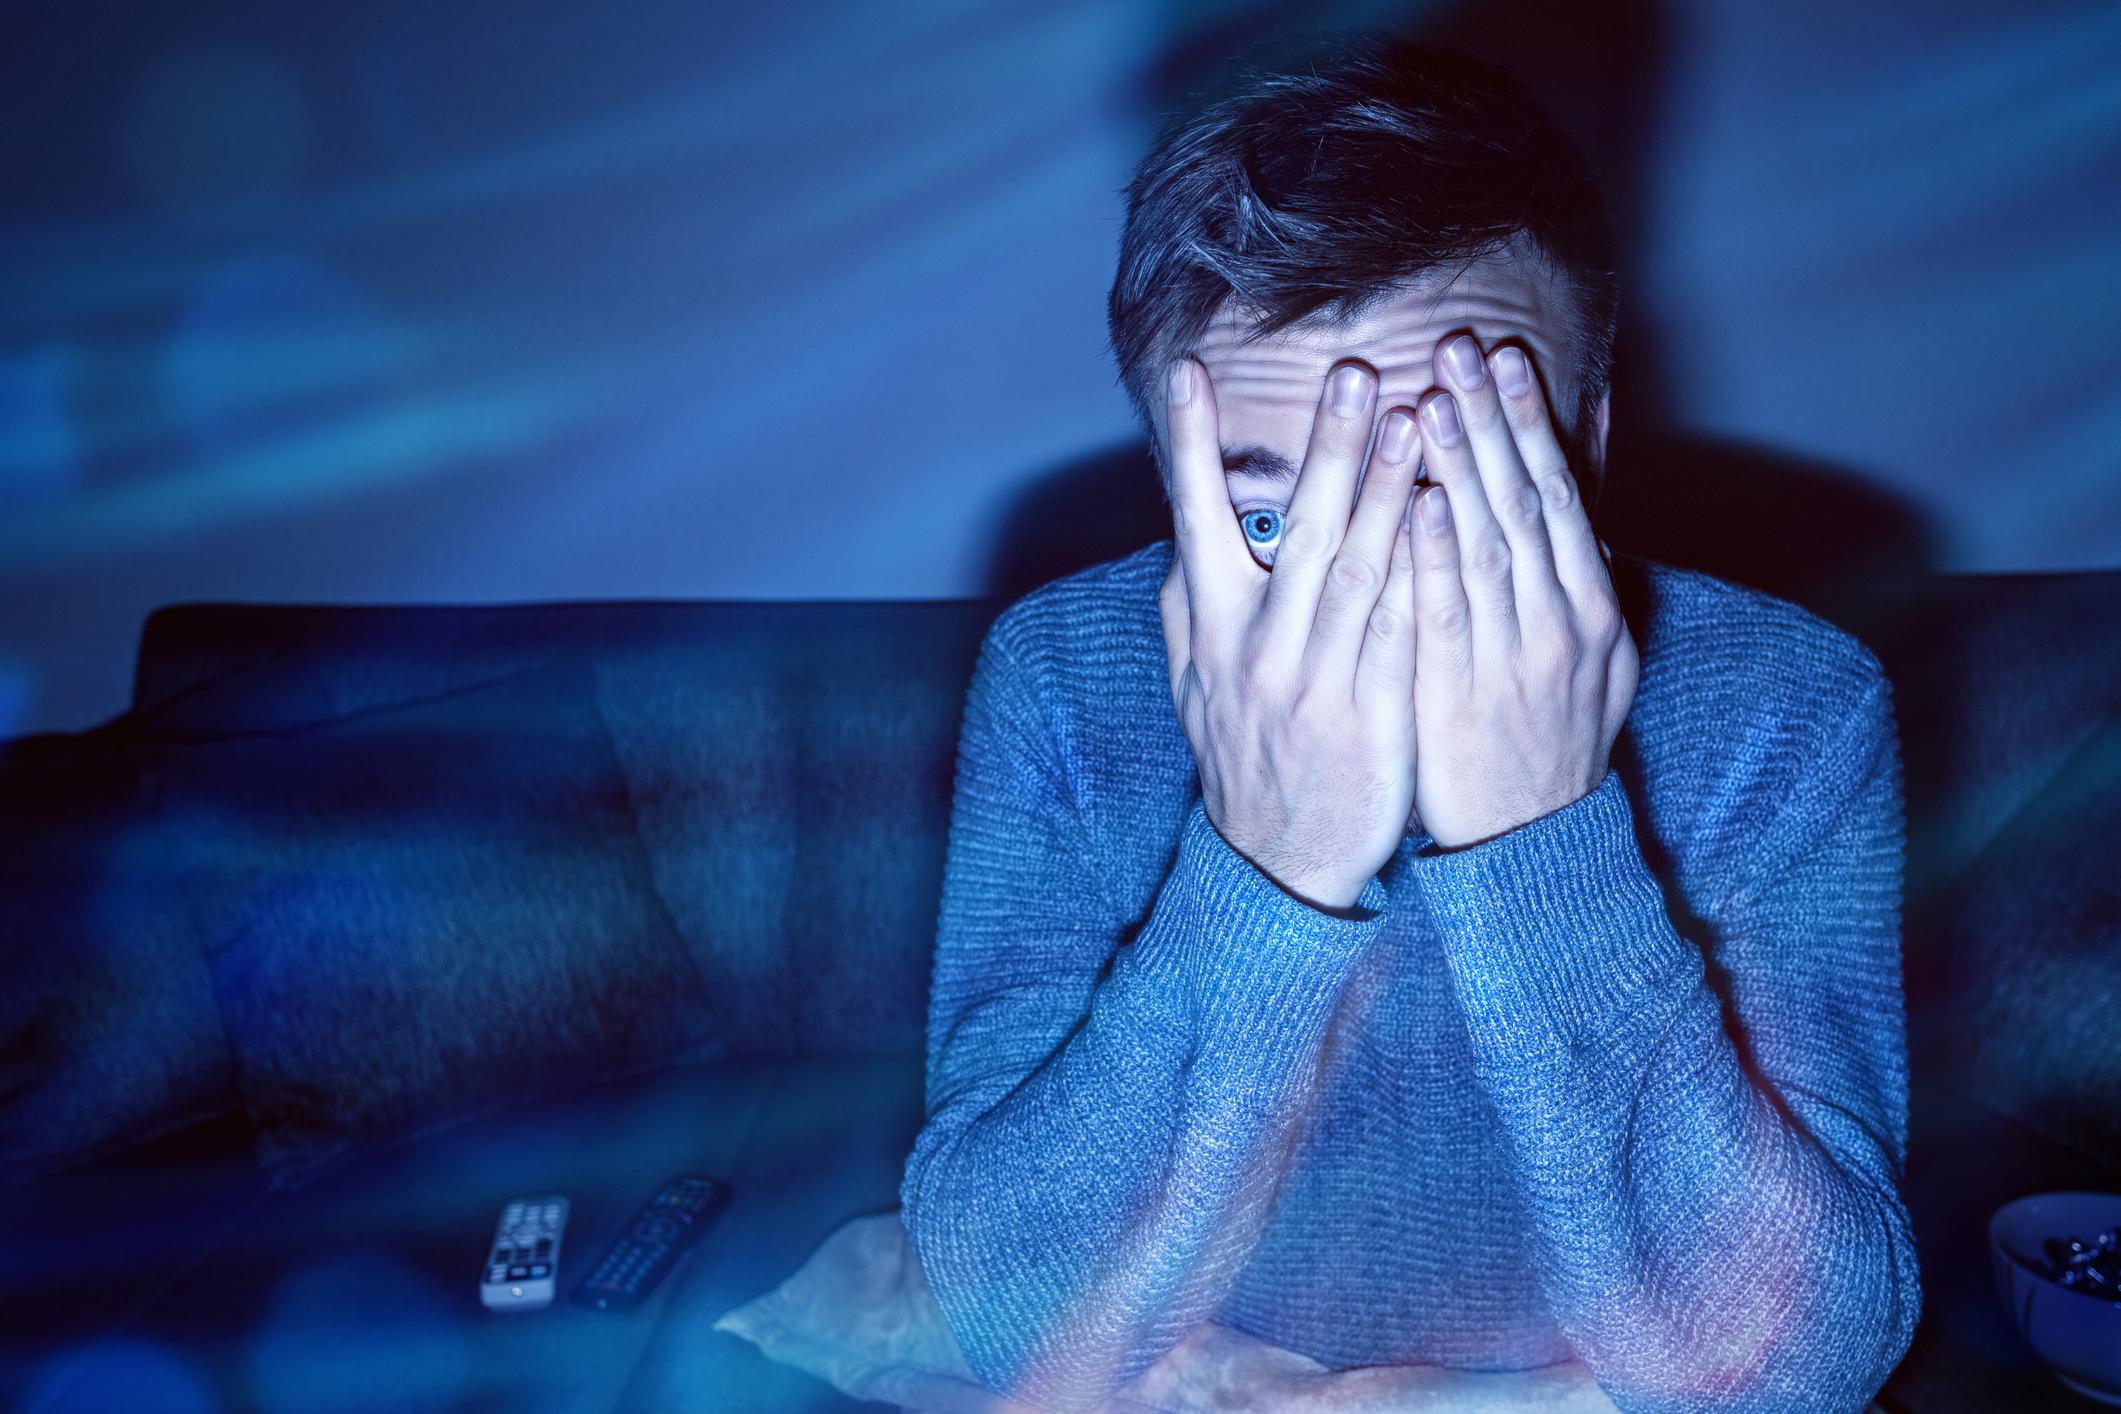 Man peeping through fingers at screen